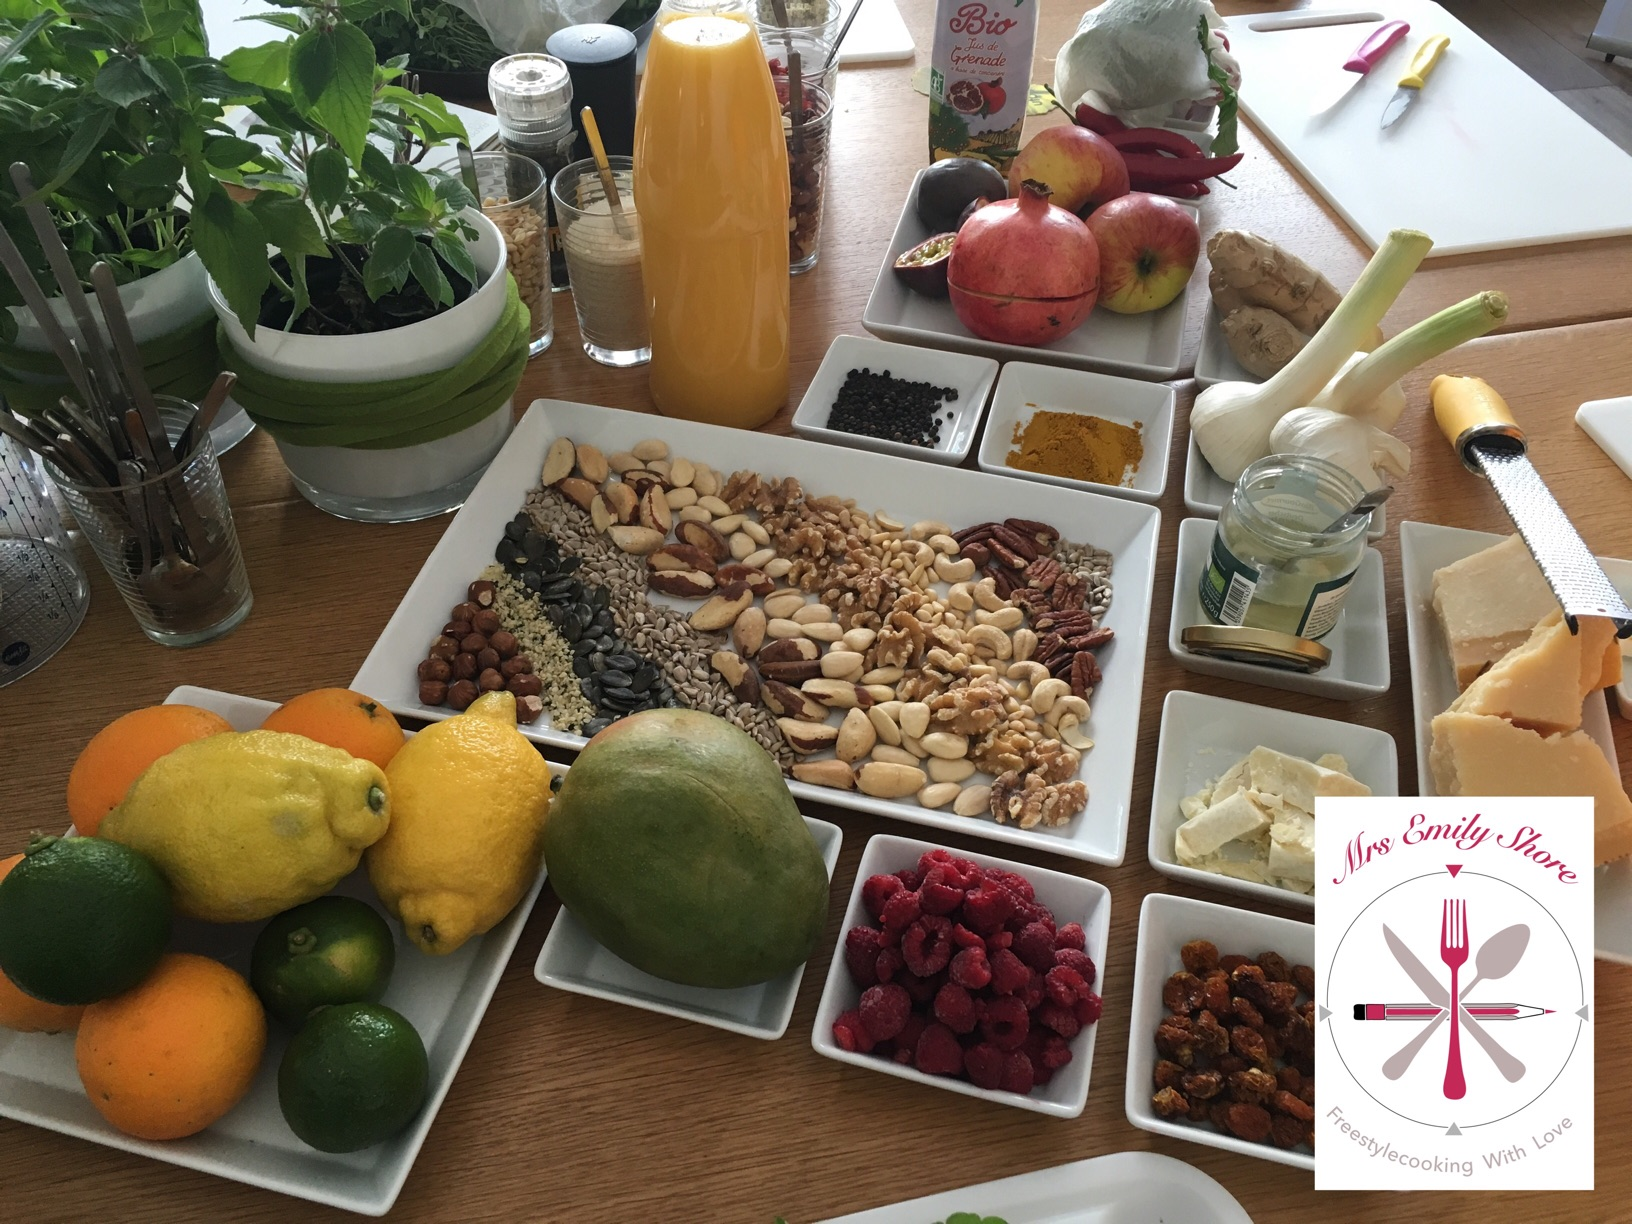 Foodblogday München 2016 Hubert Burda Media UFOP Rapsöl Wildkräuter Pesto